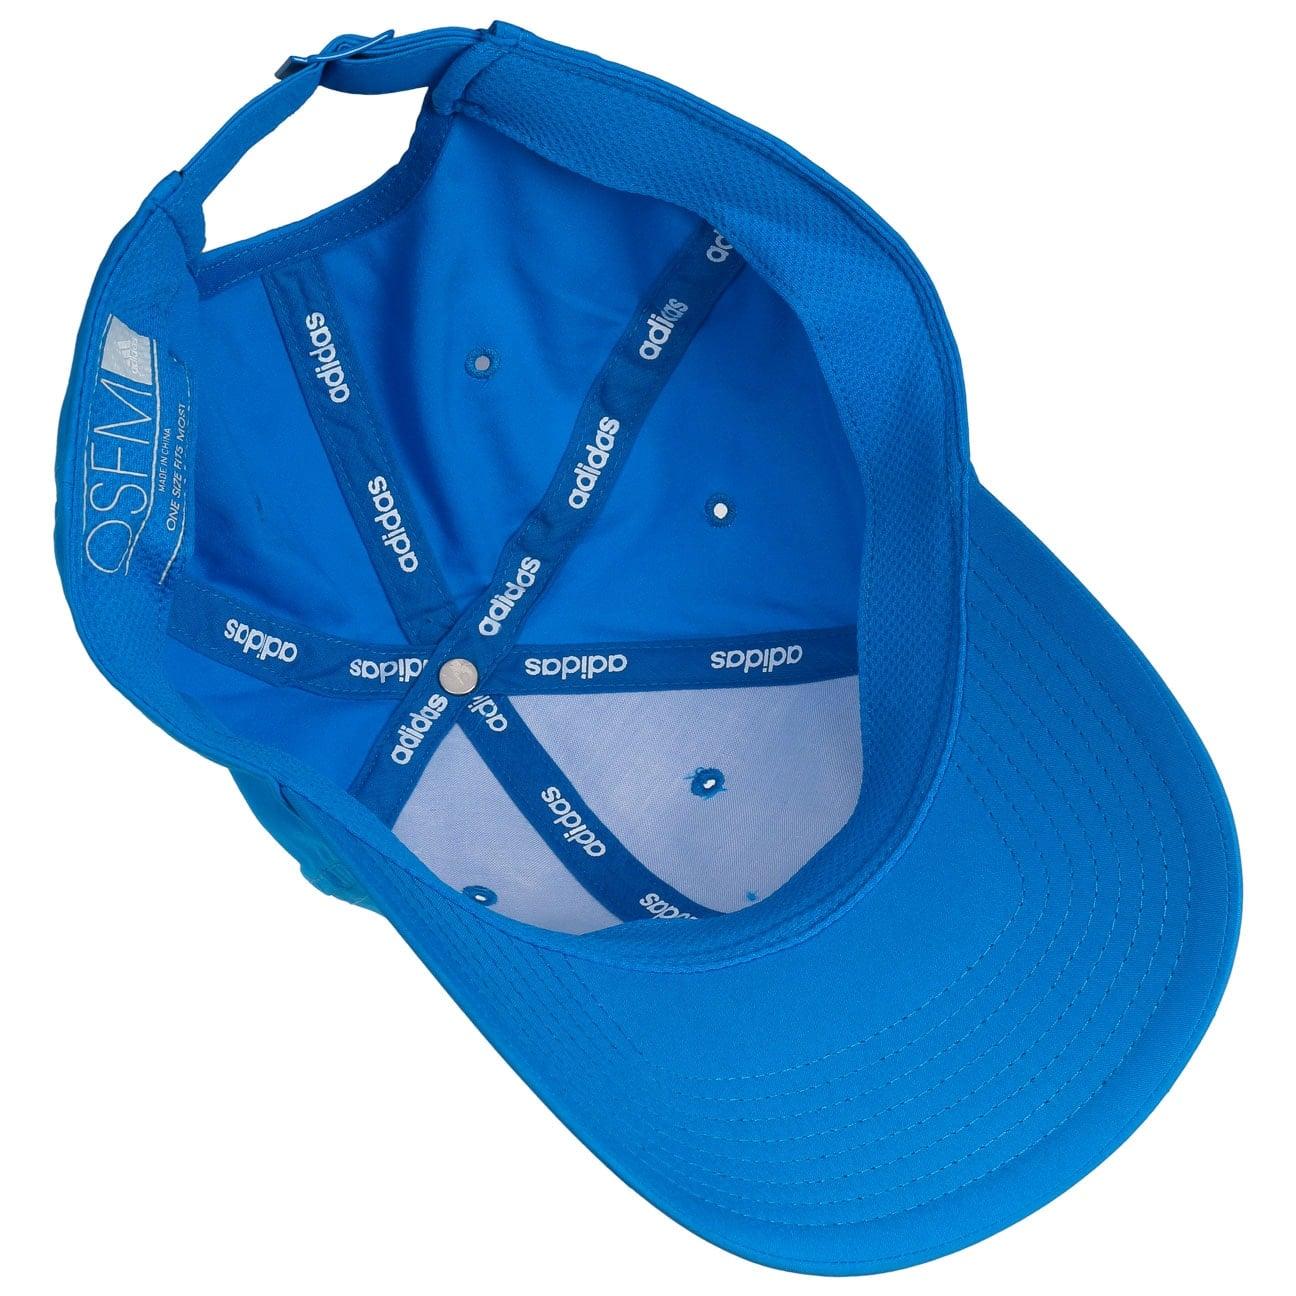 Celeste gorra metal sports adidas azul jpg 1296x1296 Celeste gorras adidas 17971f5c128